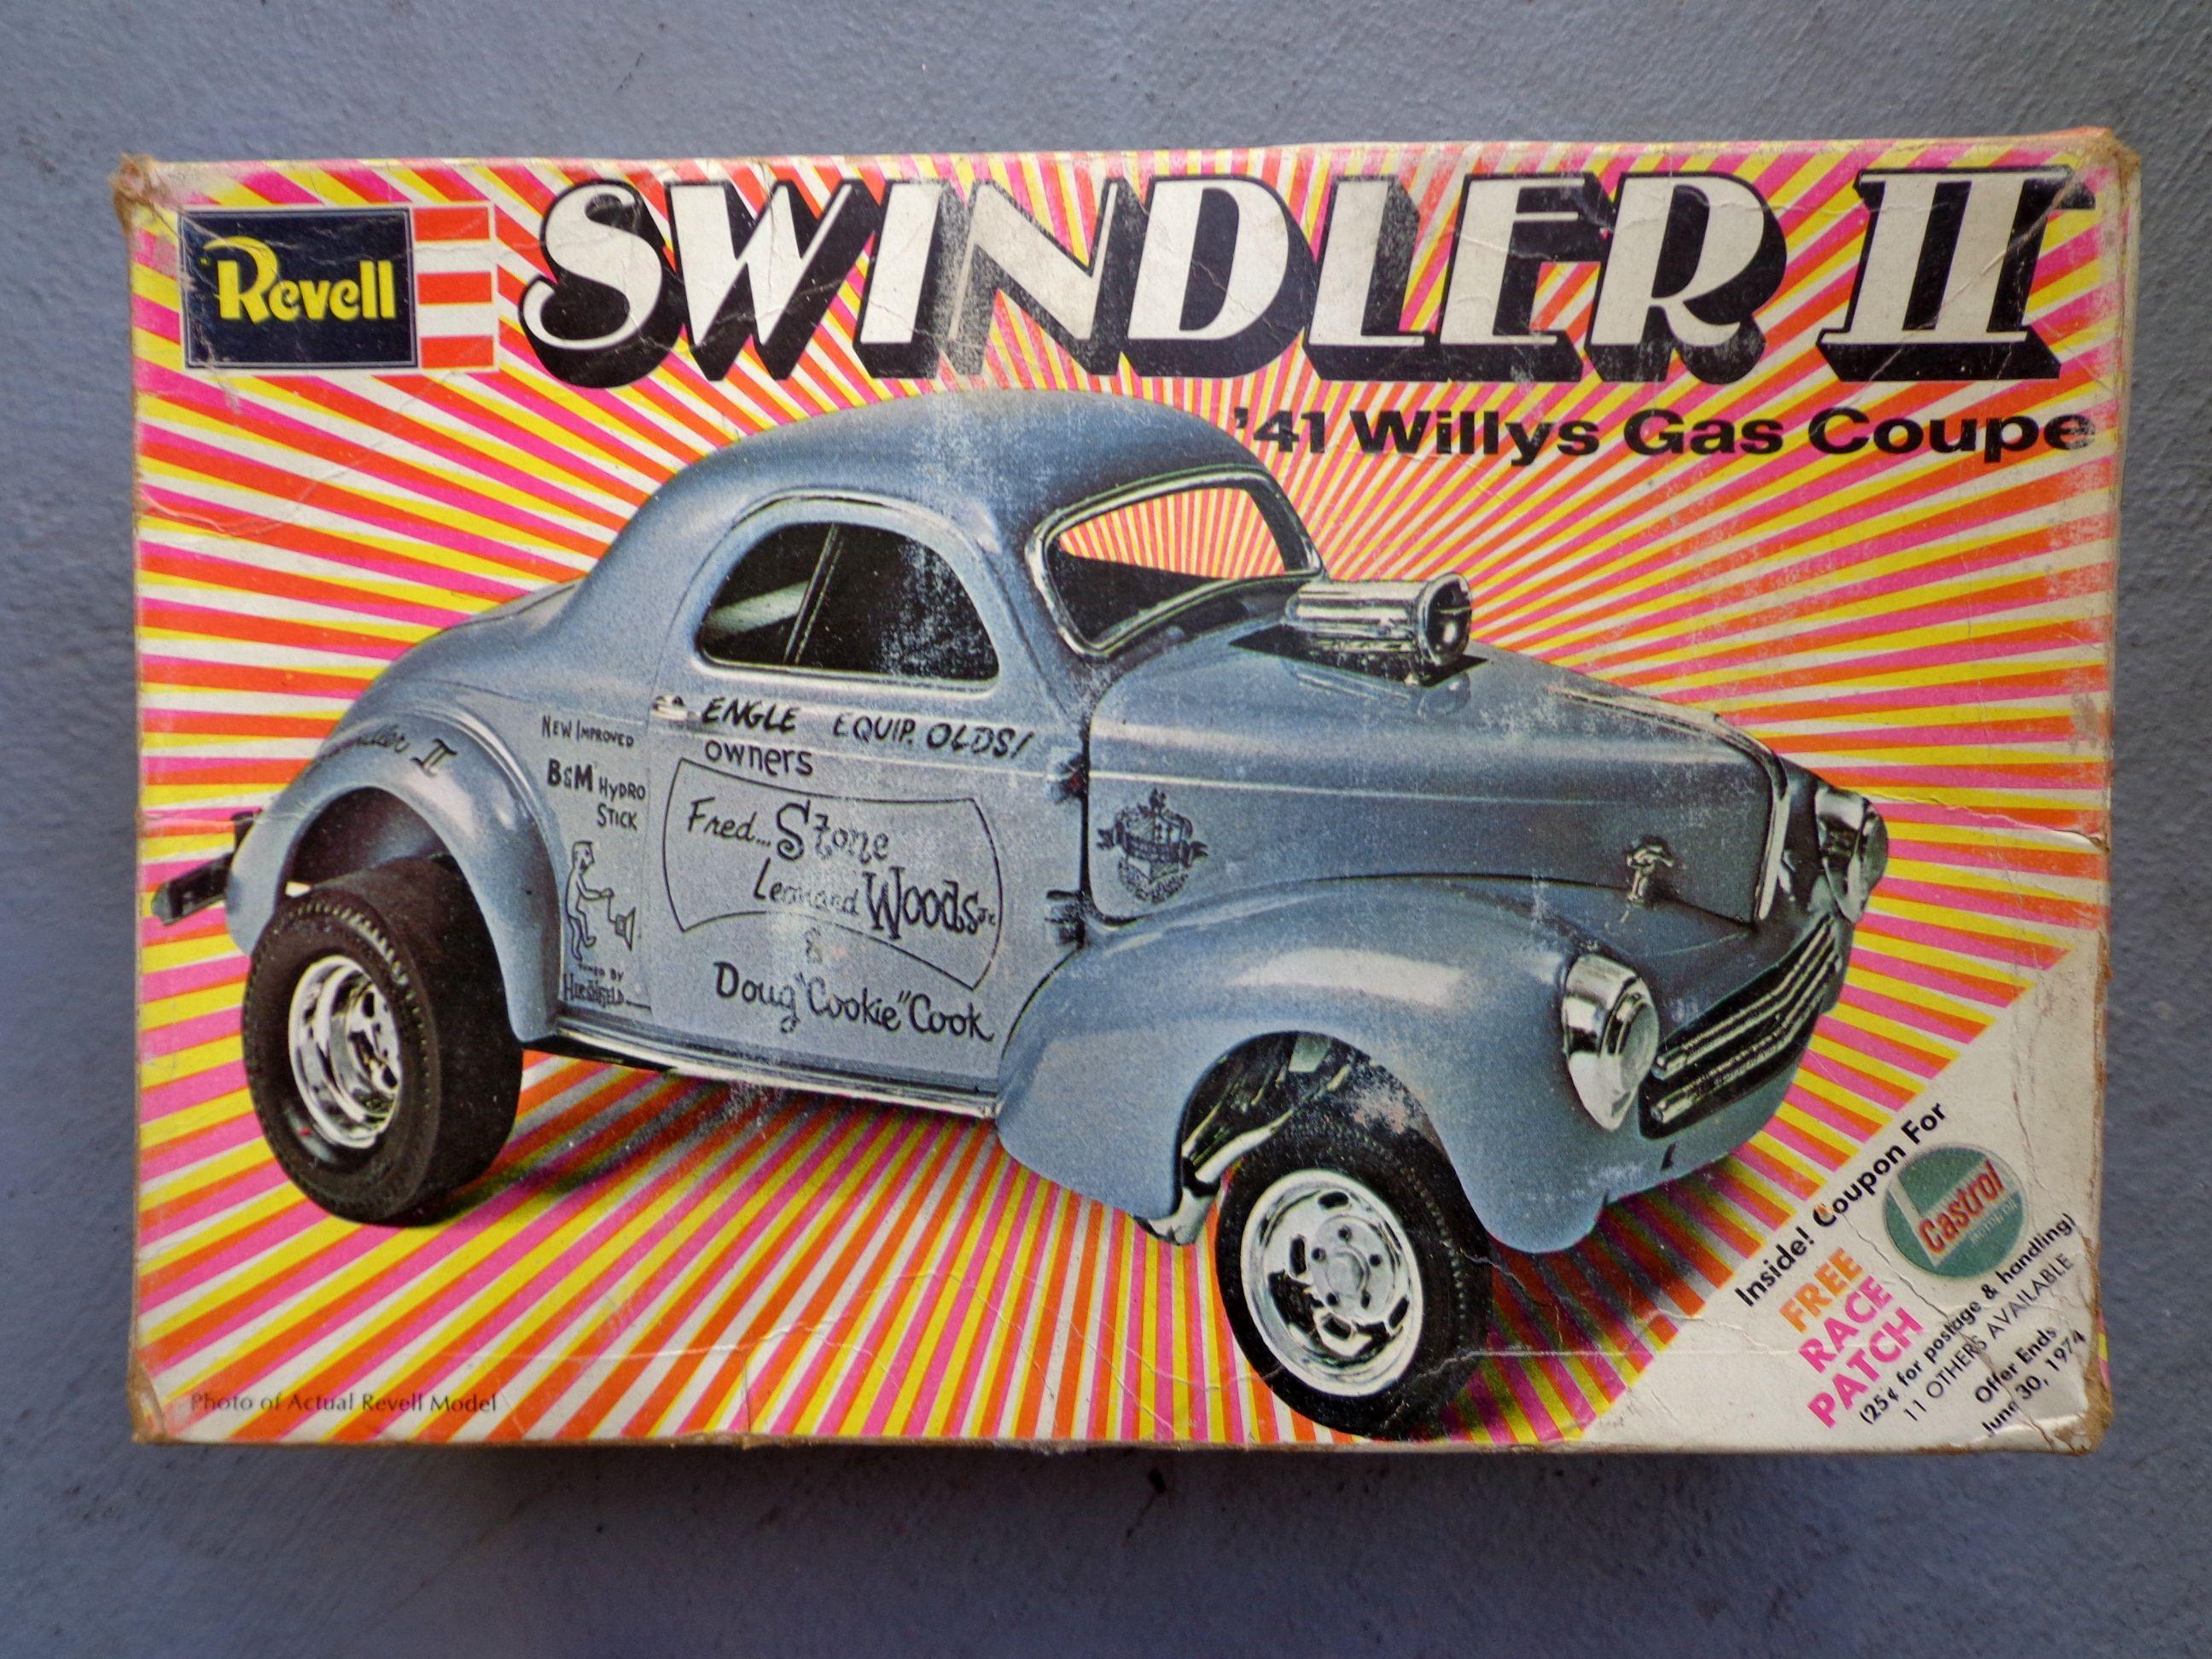 Vintage revell swindler ii model kit stores ebay com rockabillyhoodlum willys